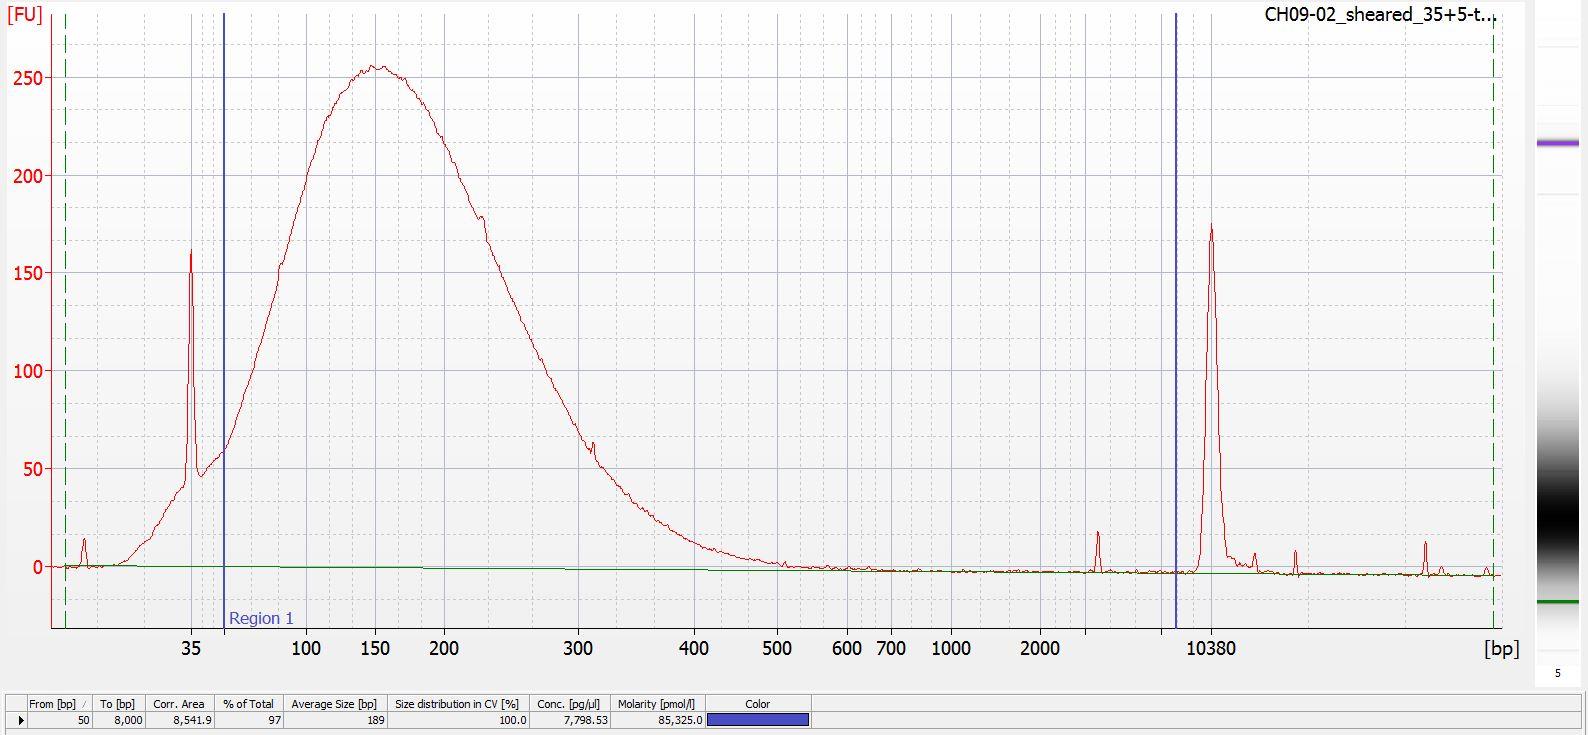 Sheared CH09-02 Bioanalyzer electropherogram